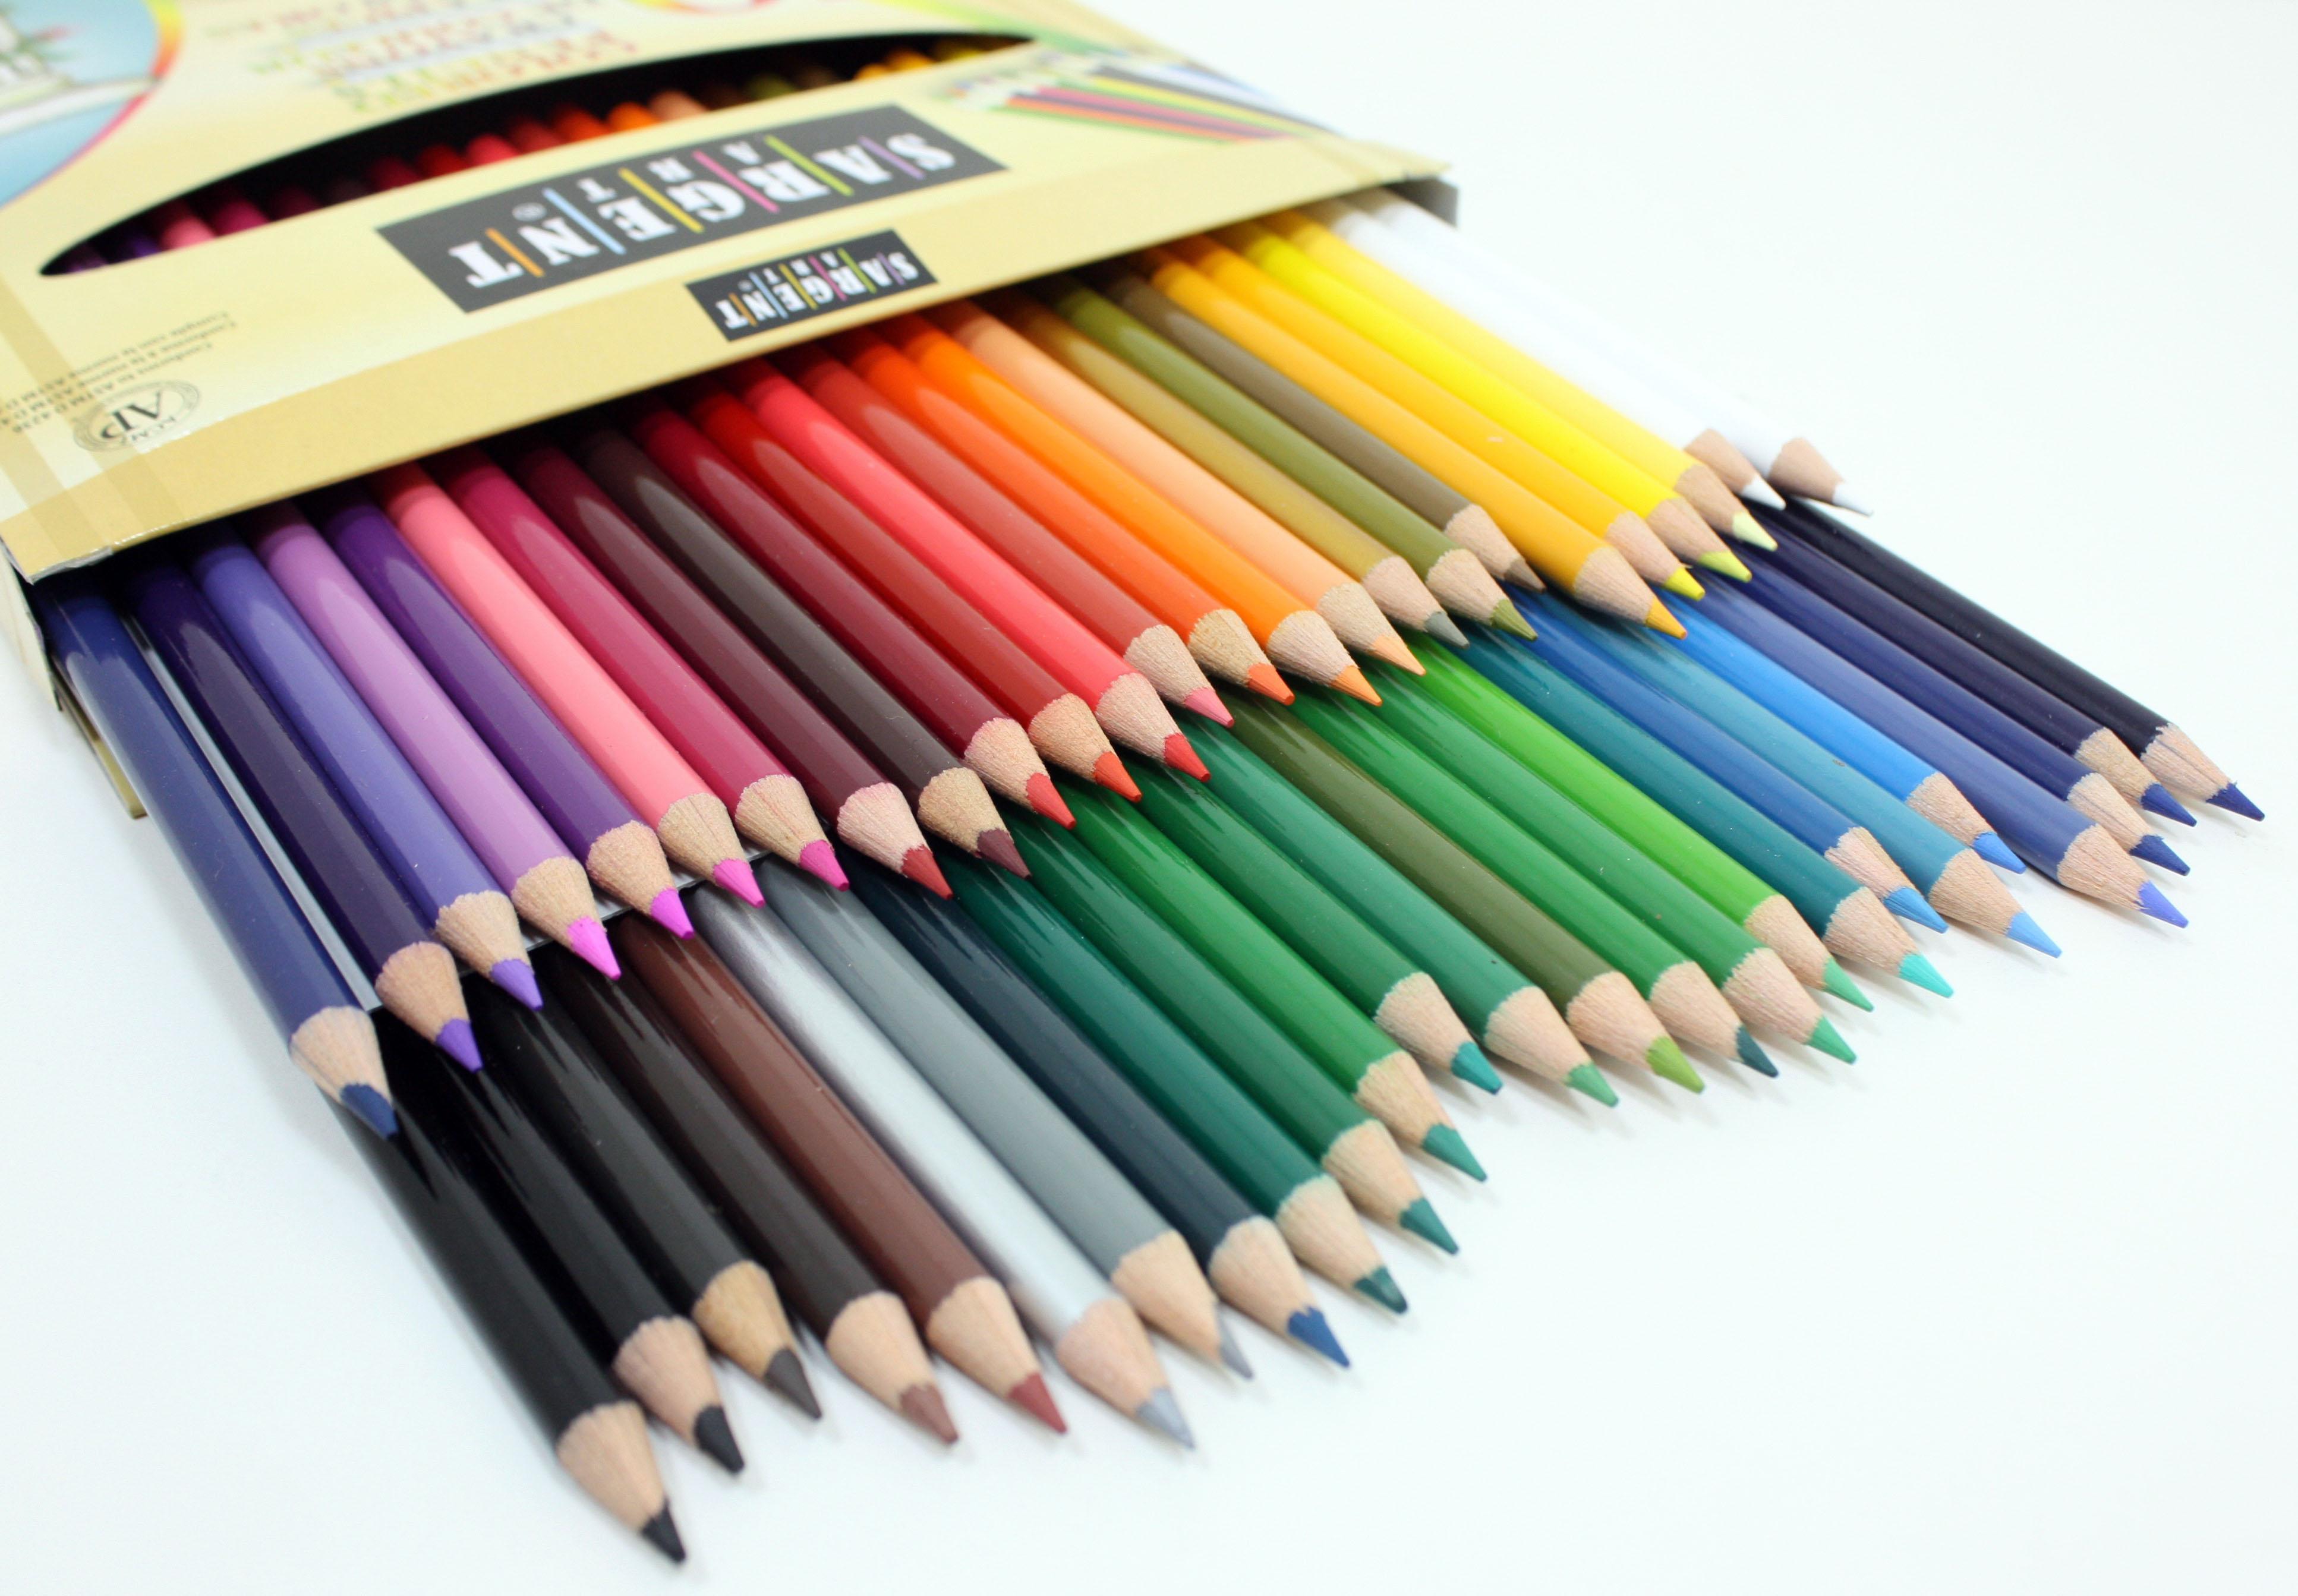 Amazon.com: Sargent Art 22-7251 Colored Pencils, Pack of ...